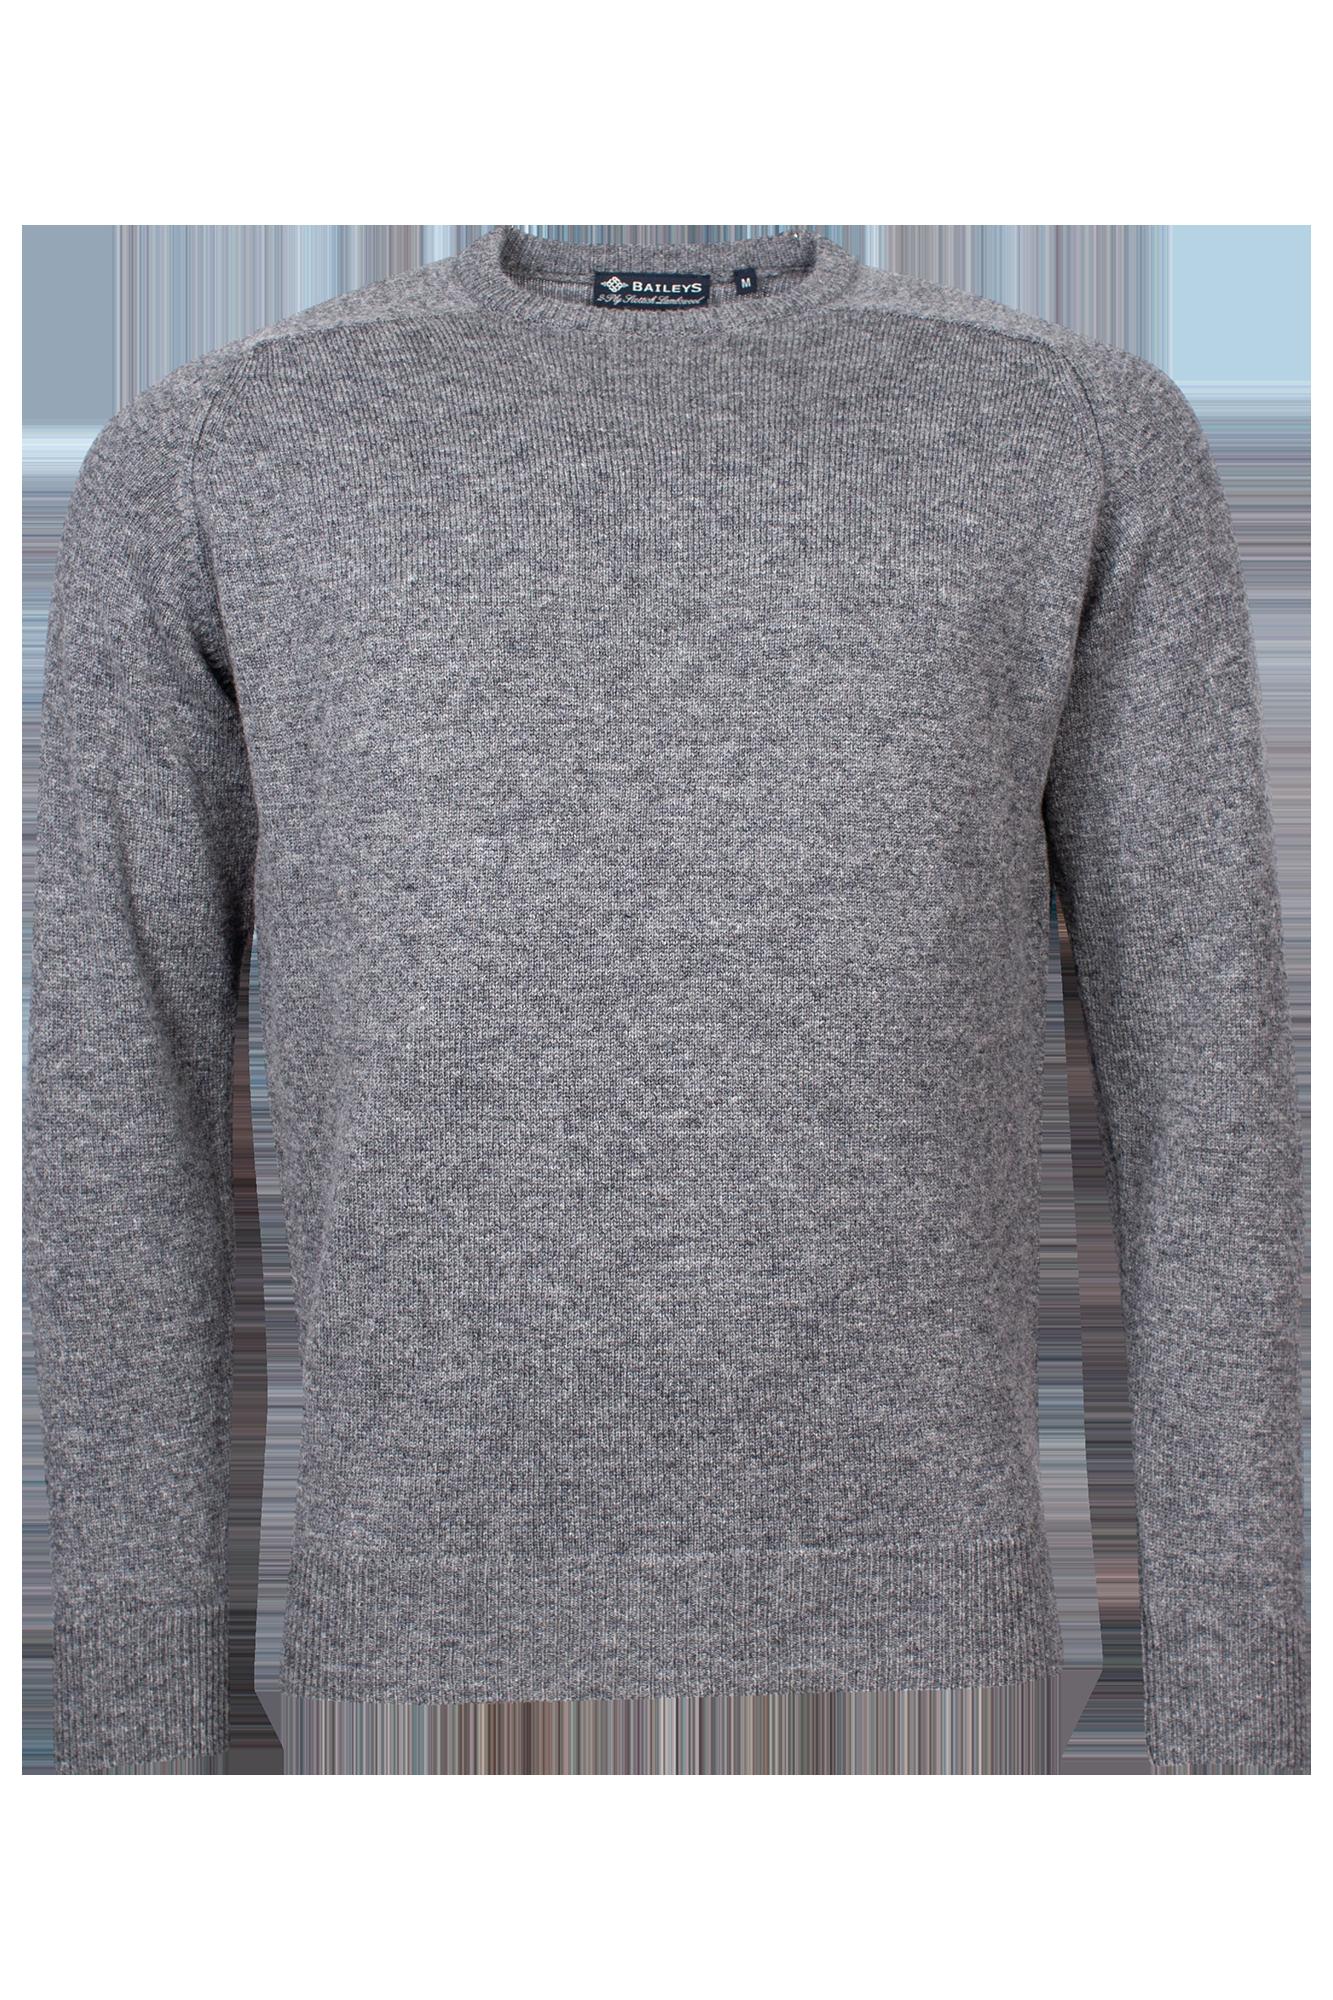 Baileys lamswollen pullover, ronde hals, grijs